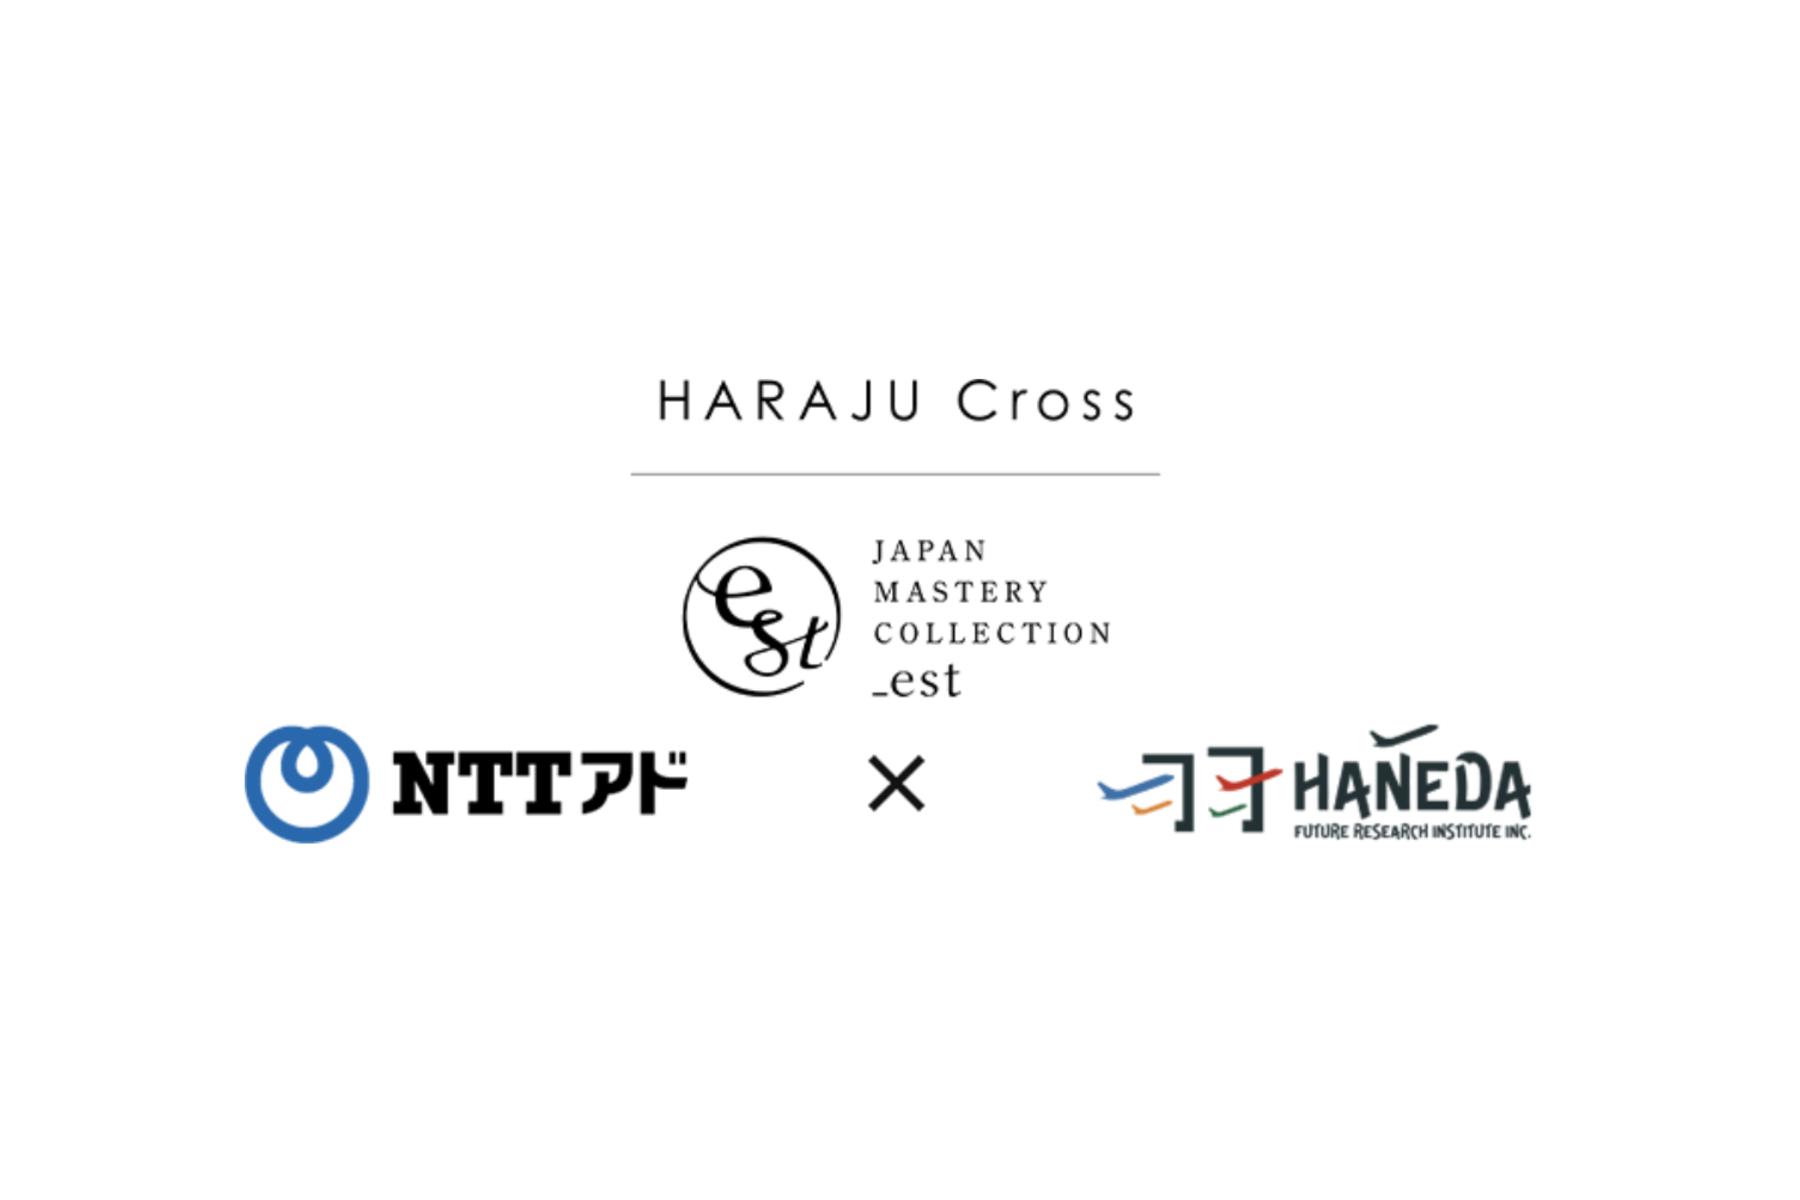 羽田未来総合研究所×NTTアド | 実験的店舗『HARAJU Cross JMC_est』を開業